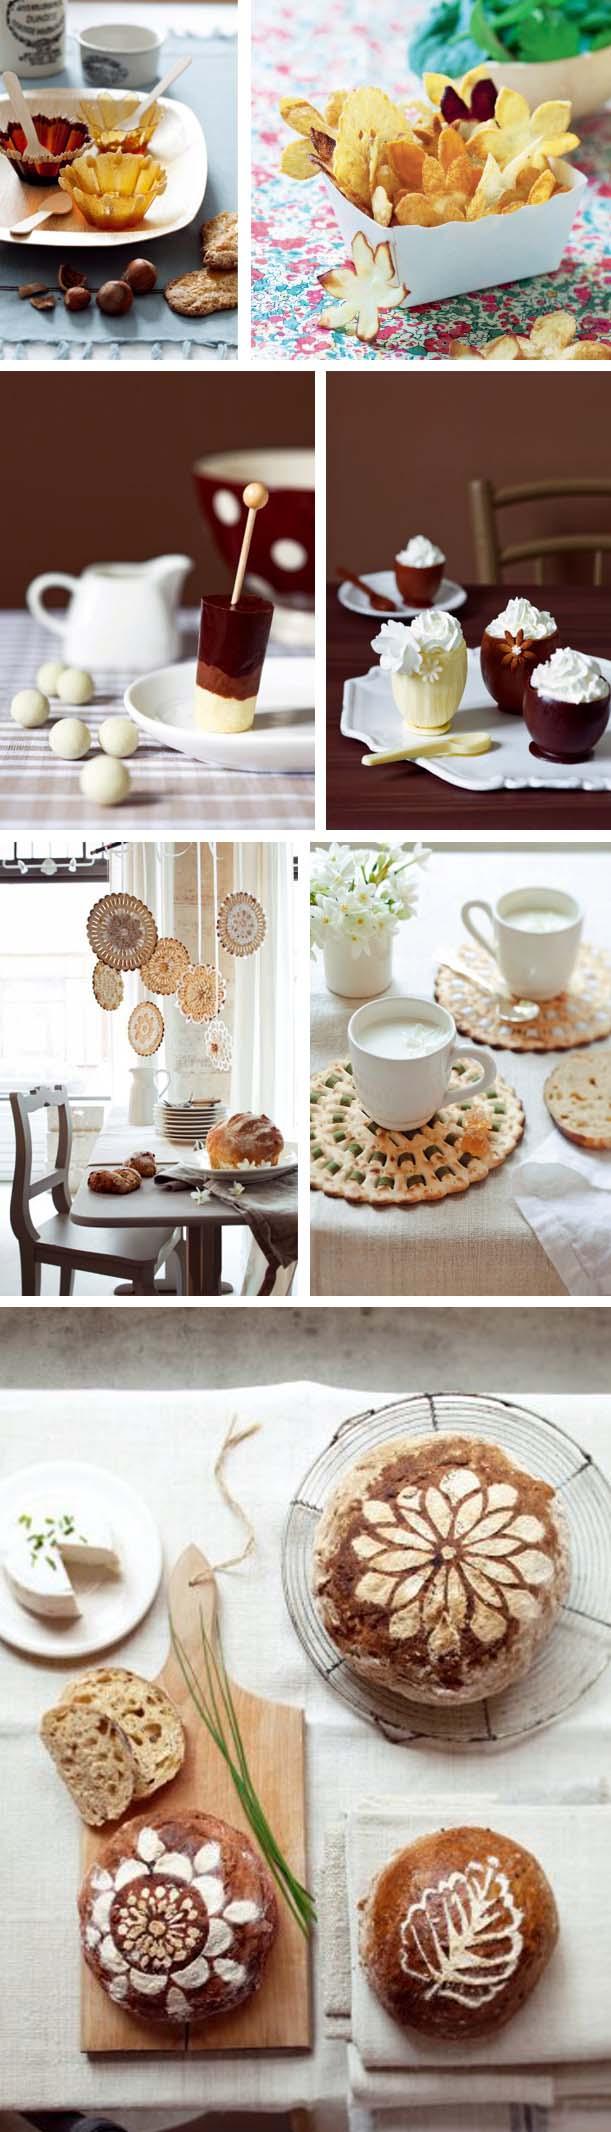 Vania Leroy-Thuillier, Tania Zaoui food styling